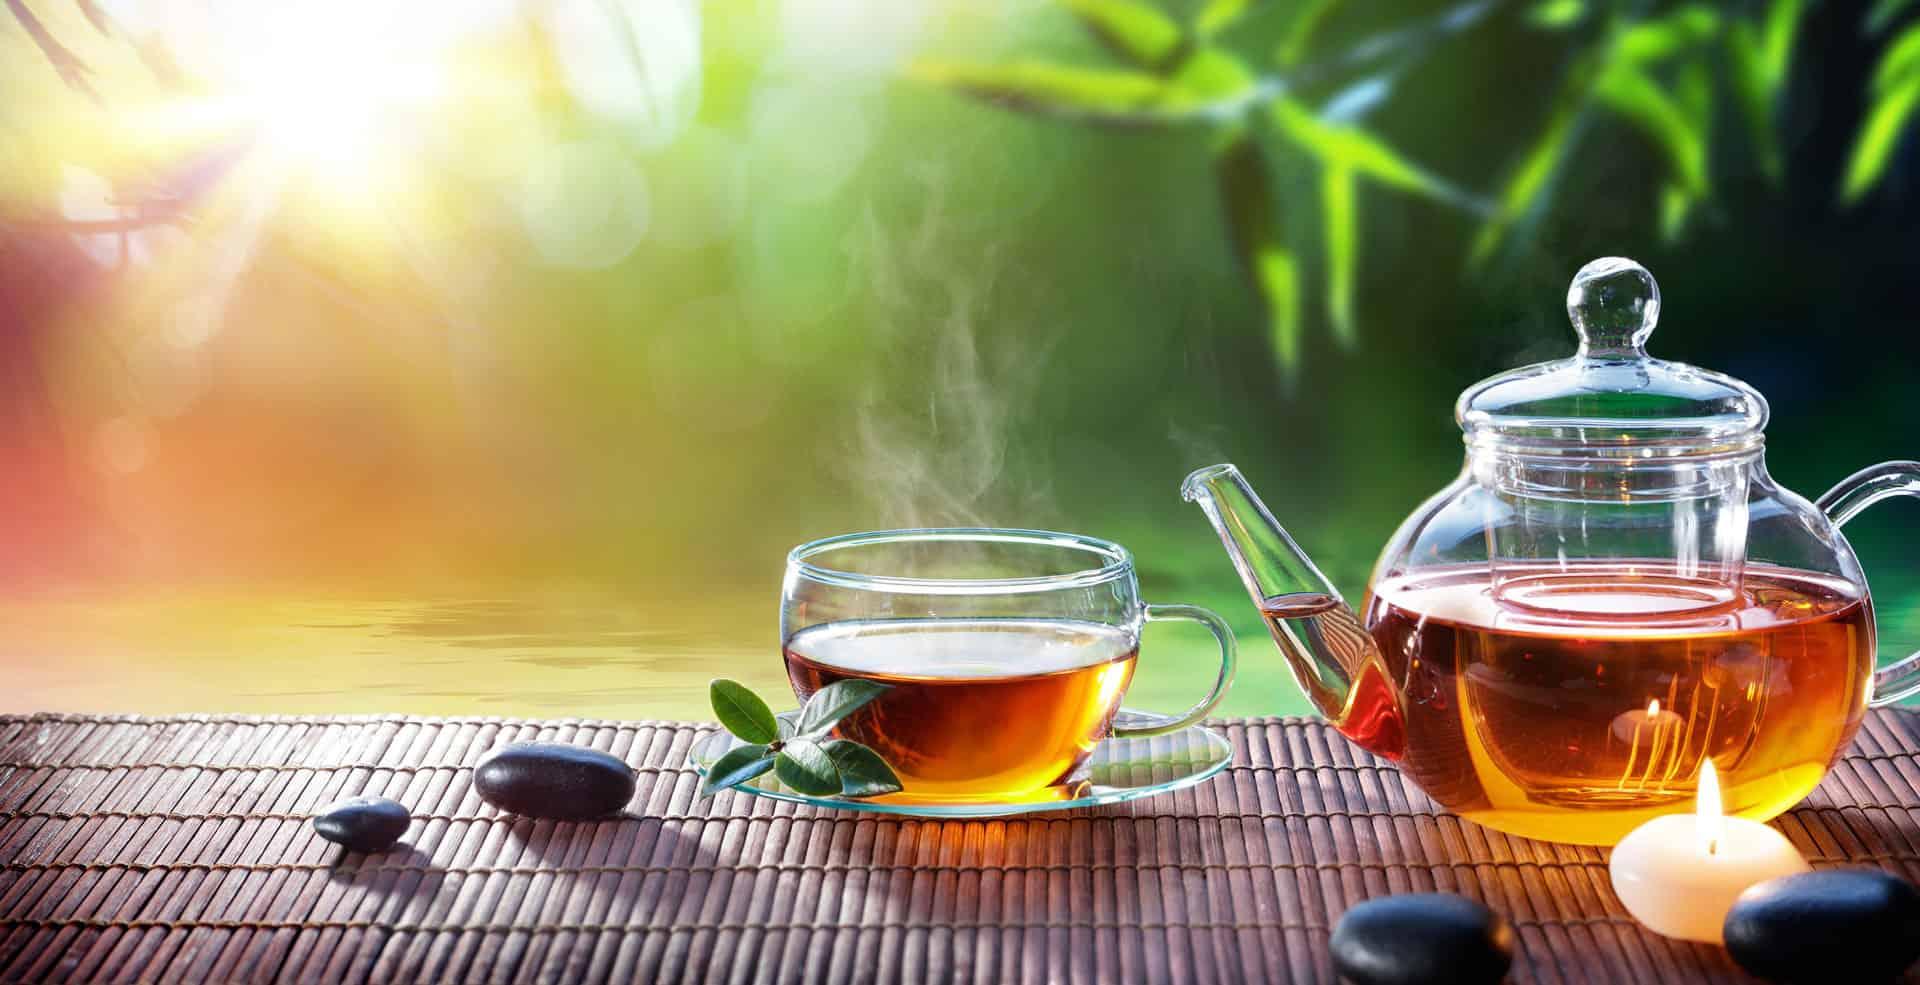 Vital Tea and Tea Pot